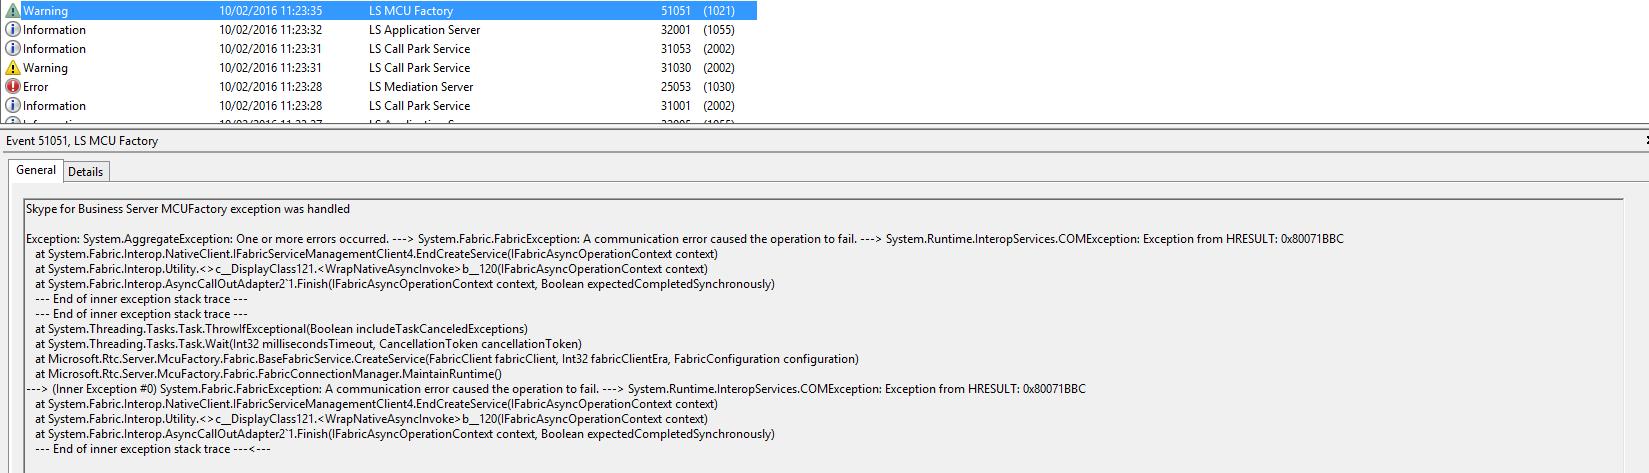 16_80071BBC_MCUFactory_Certificats